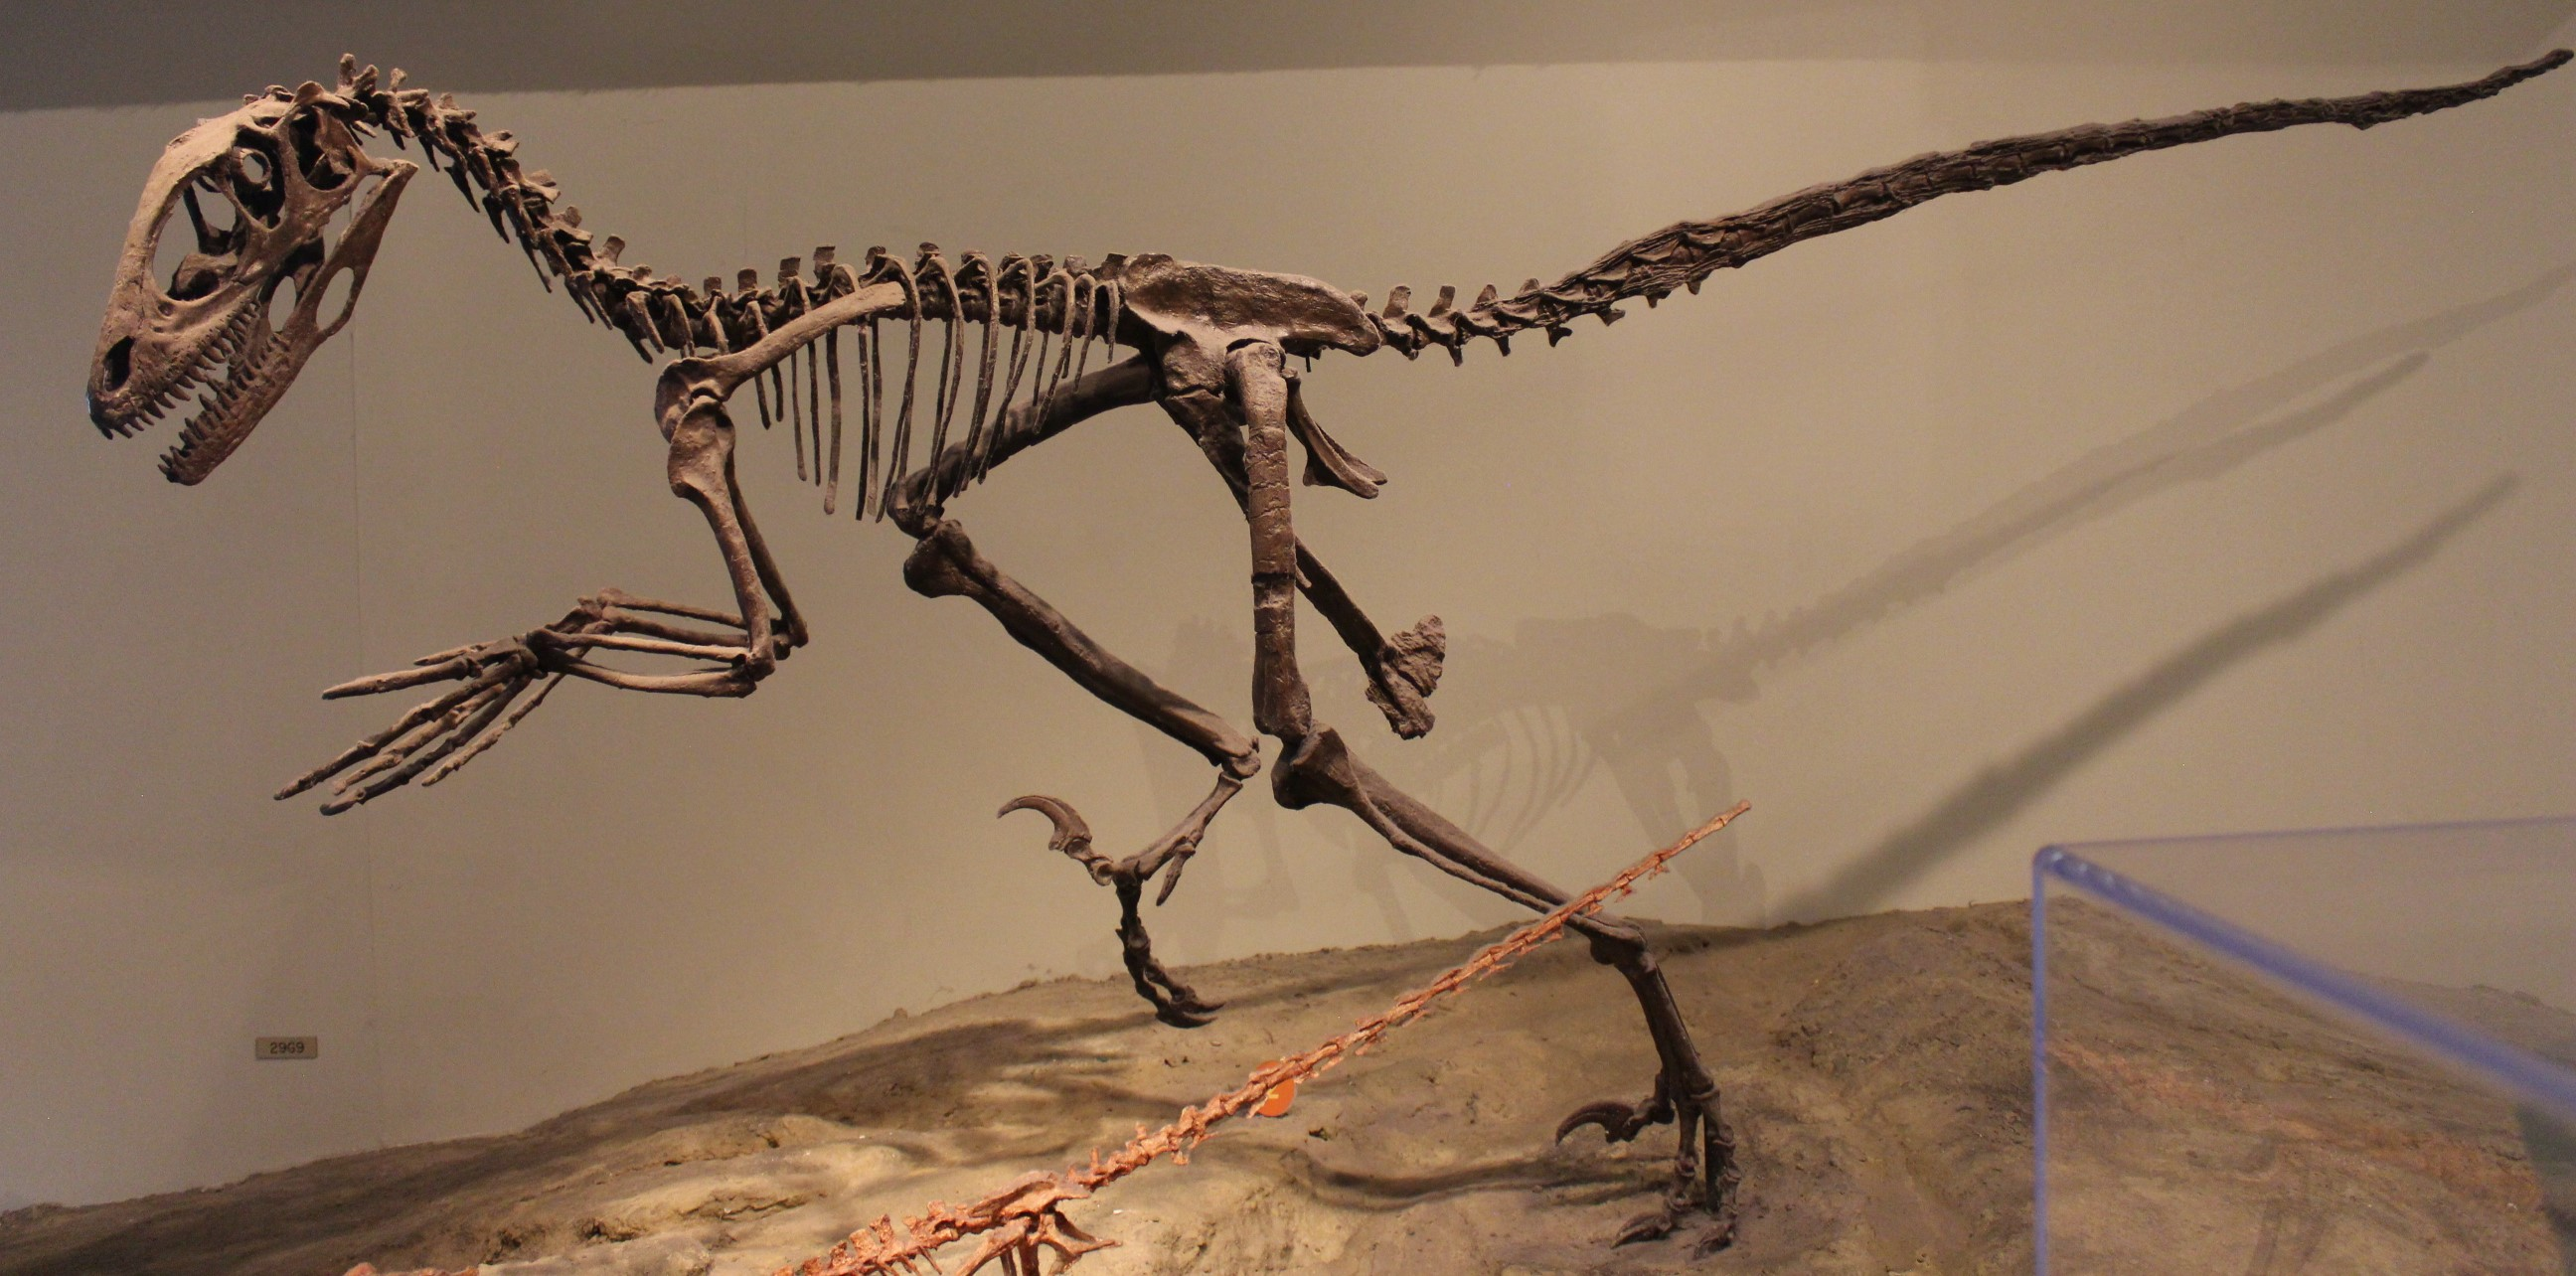 Deinonychus - Wikipedia